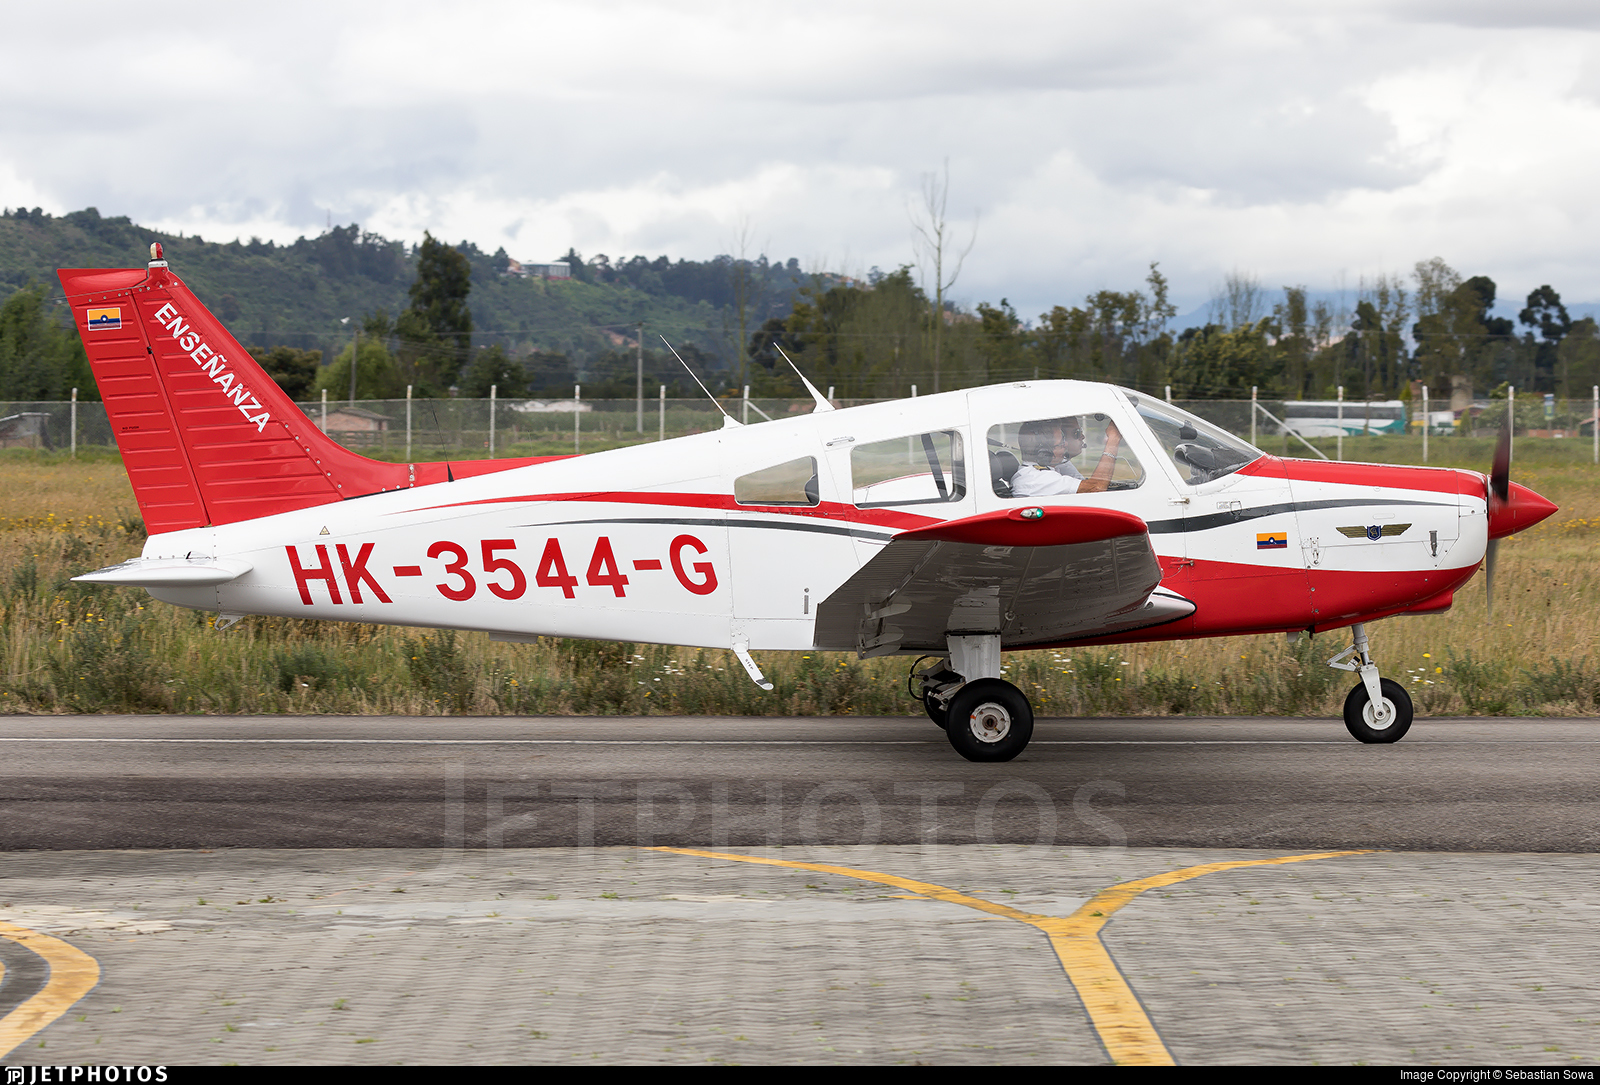 HK-3544-G - Piper PA-28-161 Warrior II - Aero Club - Colombia